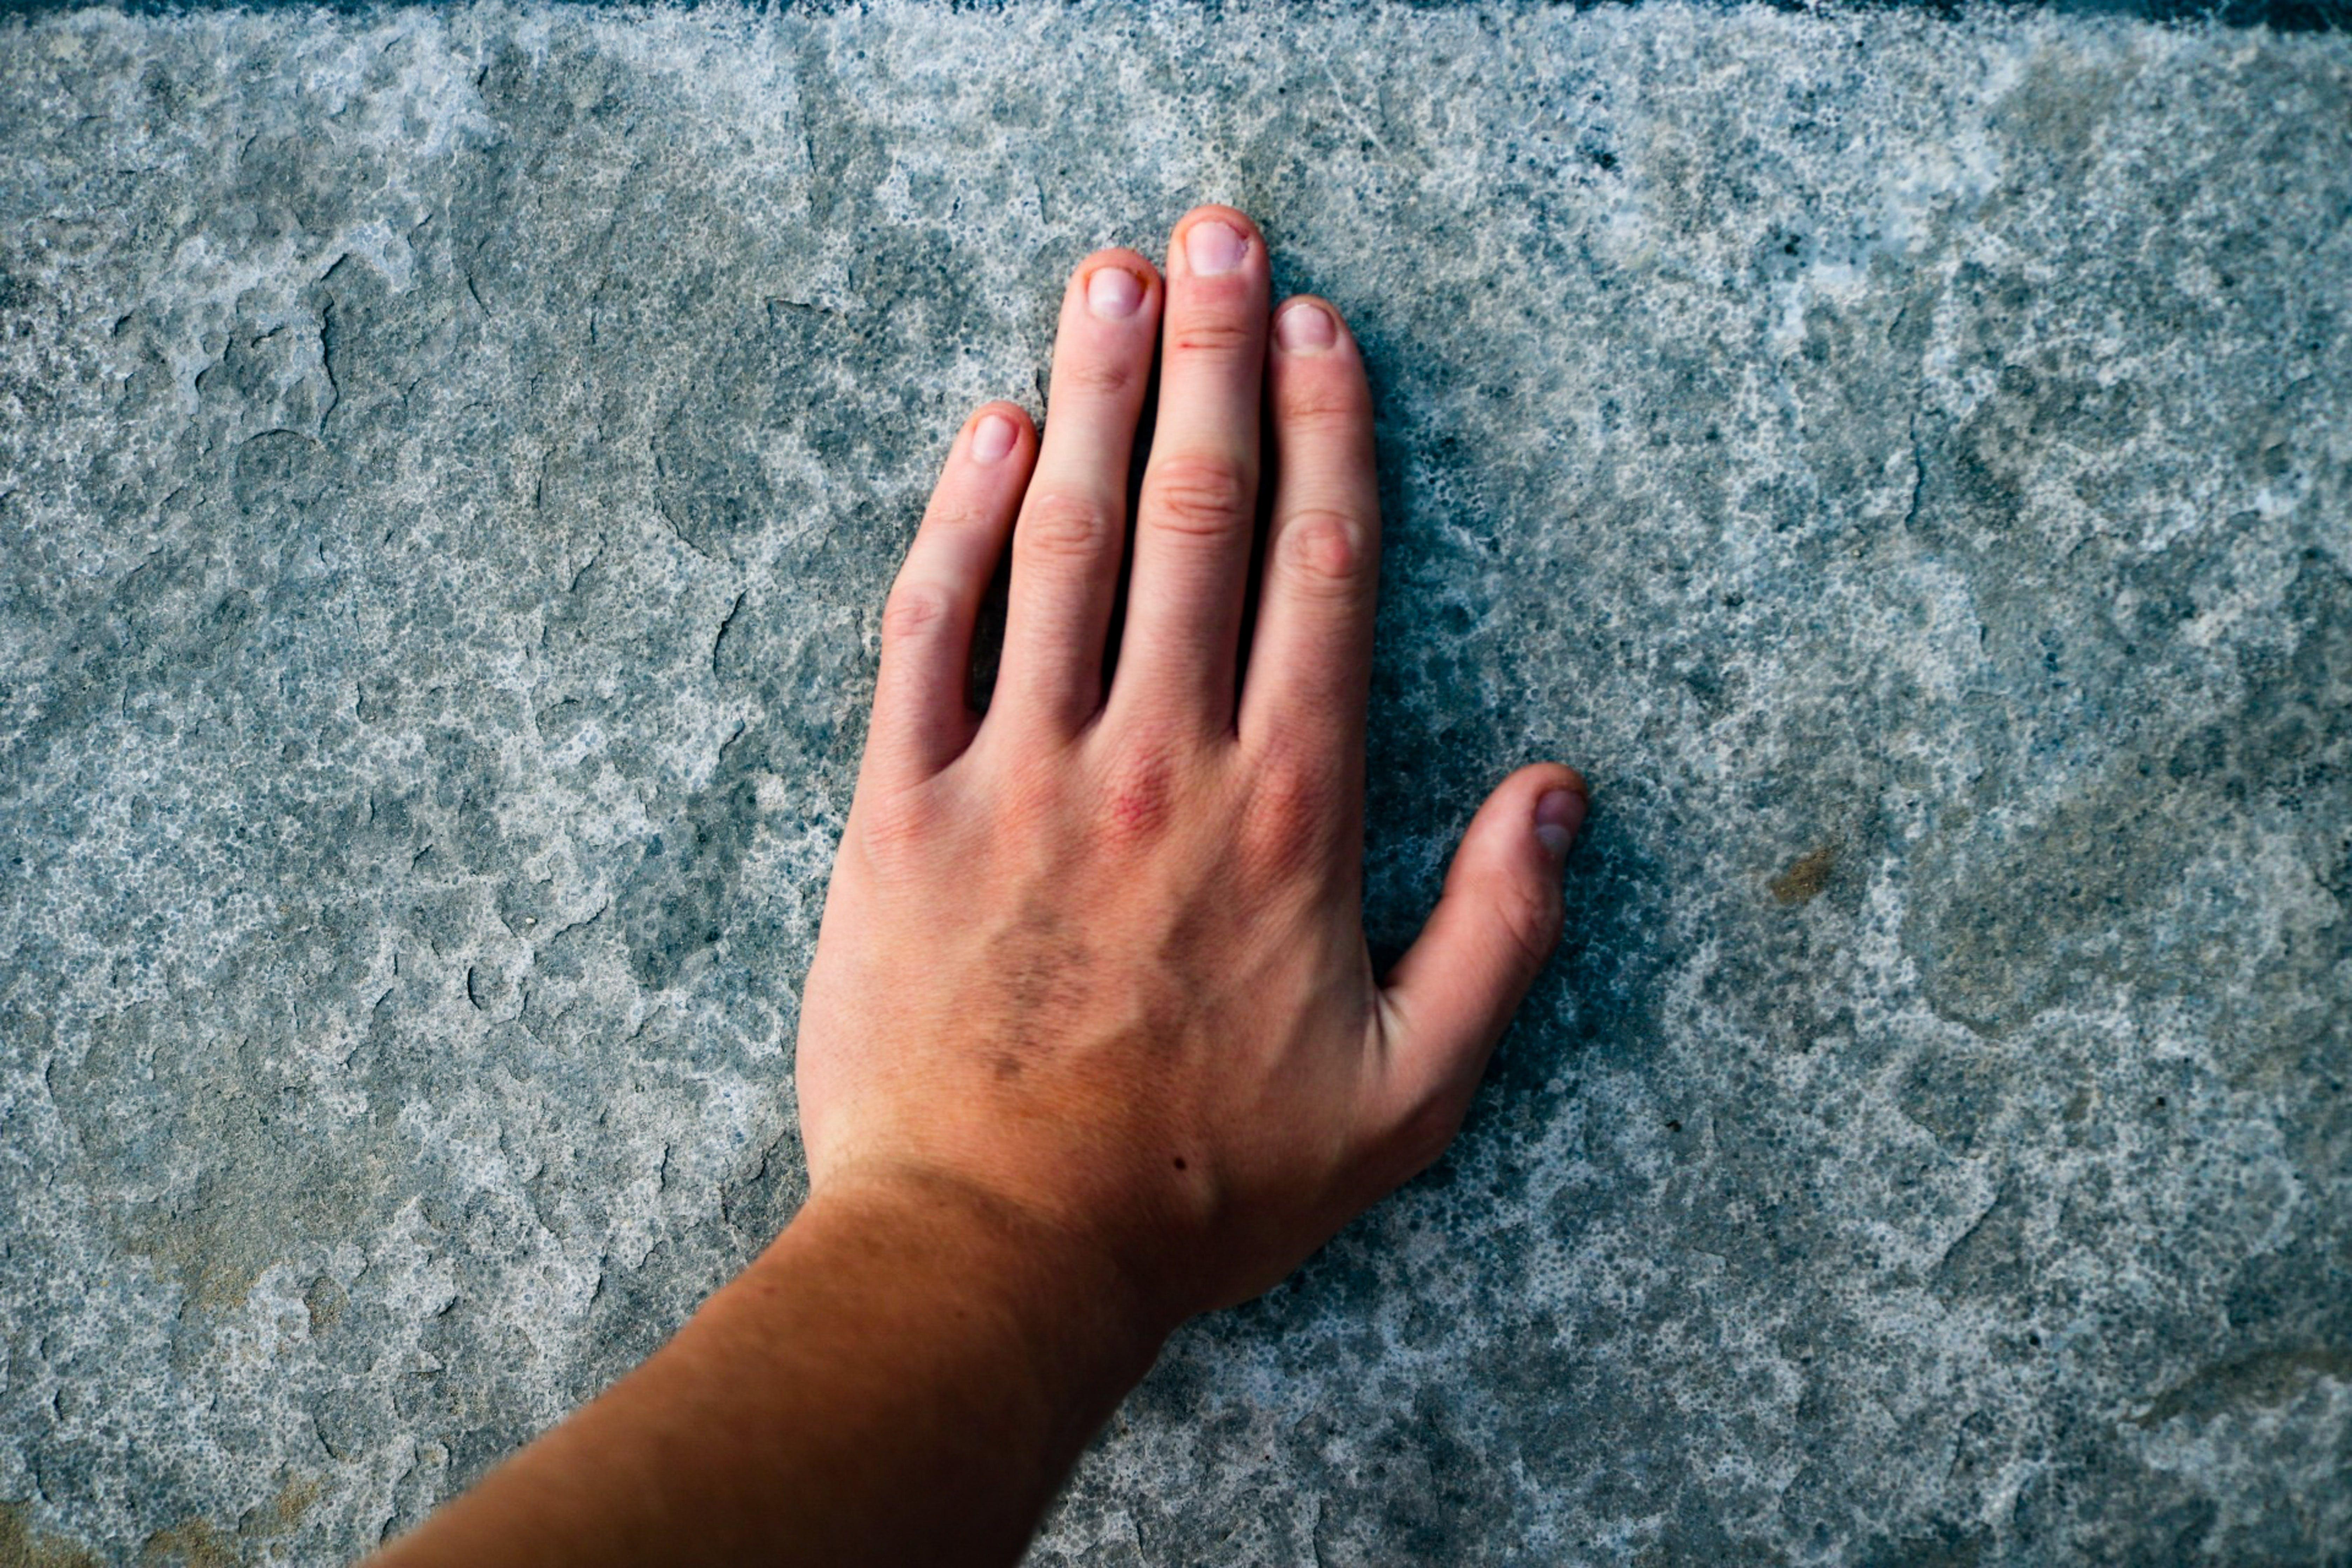 Gratis arkivbilde med fingre, hånd, overflate, Venstre hånd